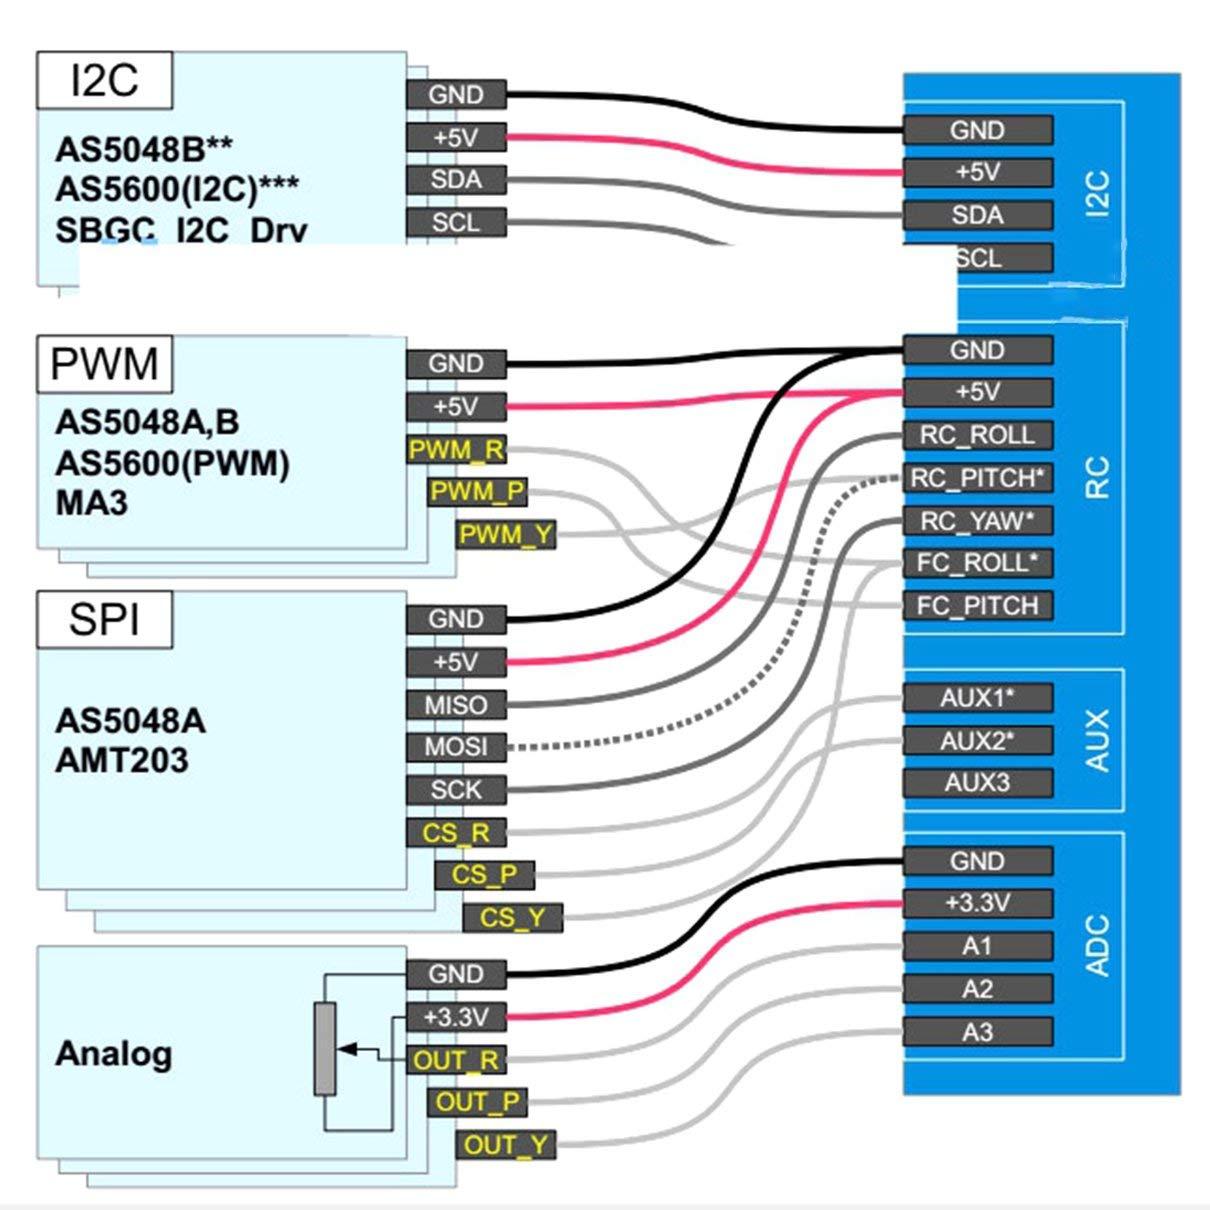 AS5600 Codificador rotativo de valor absoluto PWM Togames-ES verde I2C Puerto 12Bit para motor de card/án sin escobillas Rotativo incremental con anillo magn/ético